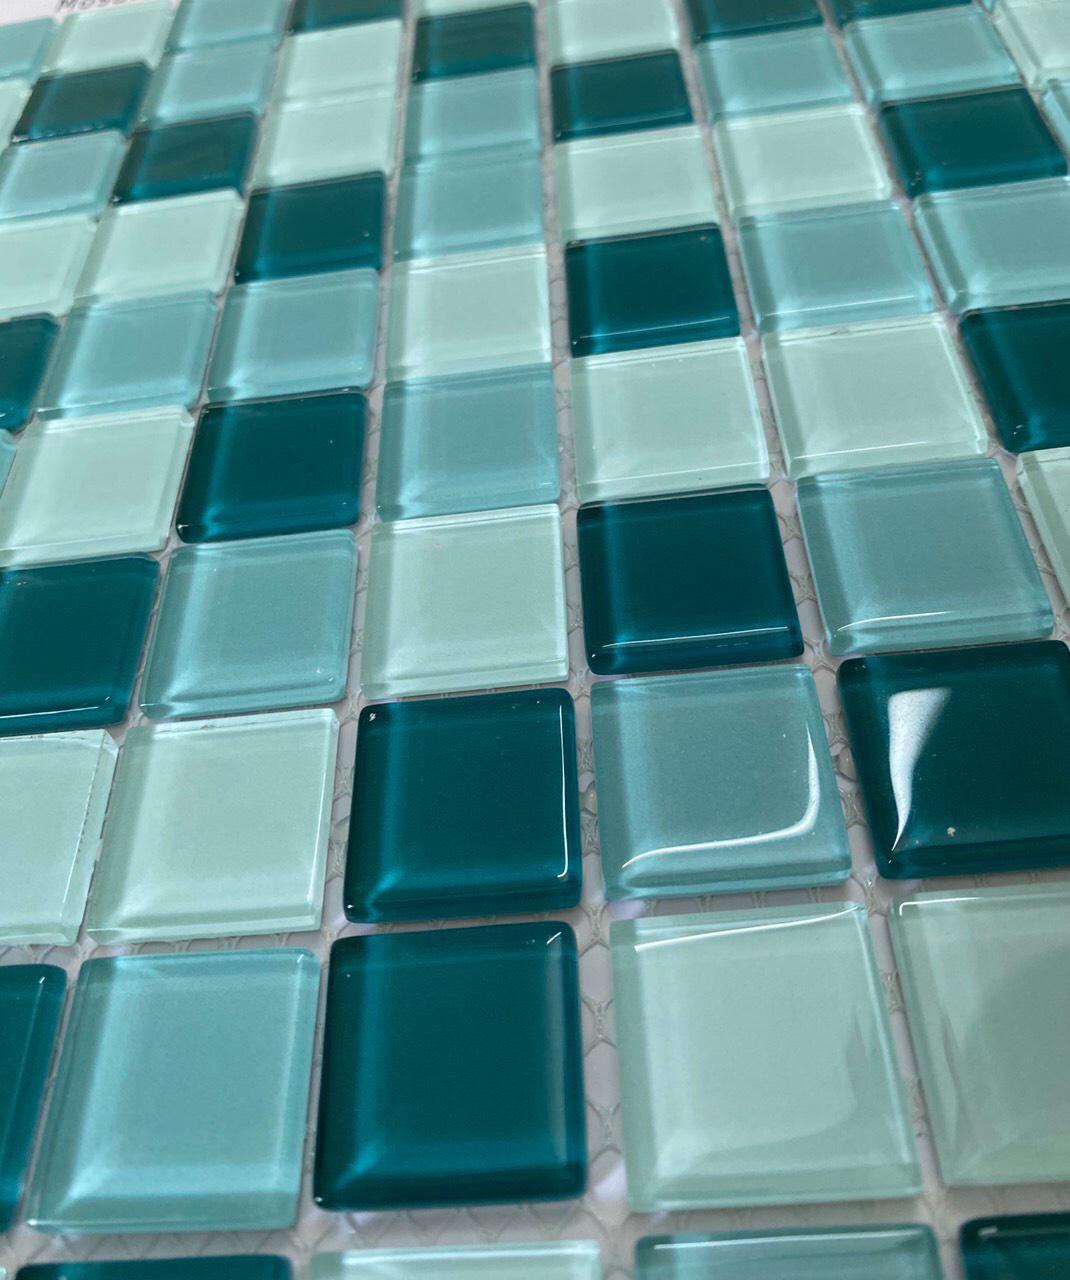 gach mosaic 30x30 xanh nhat